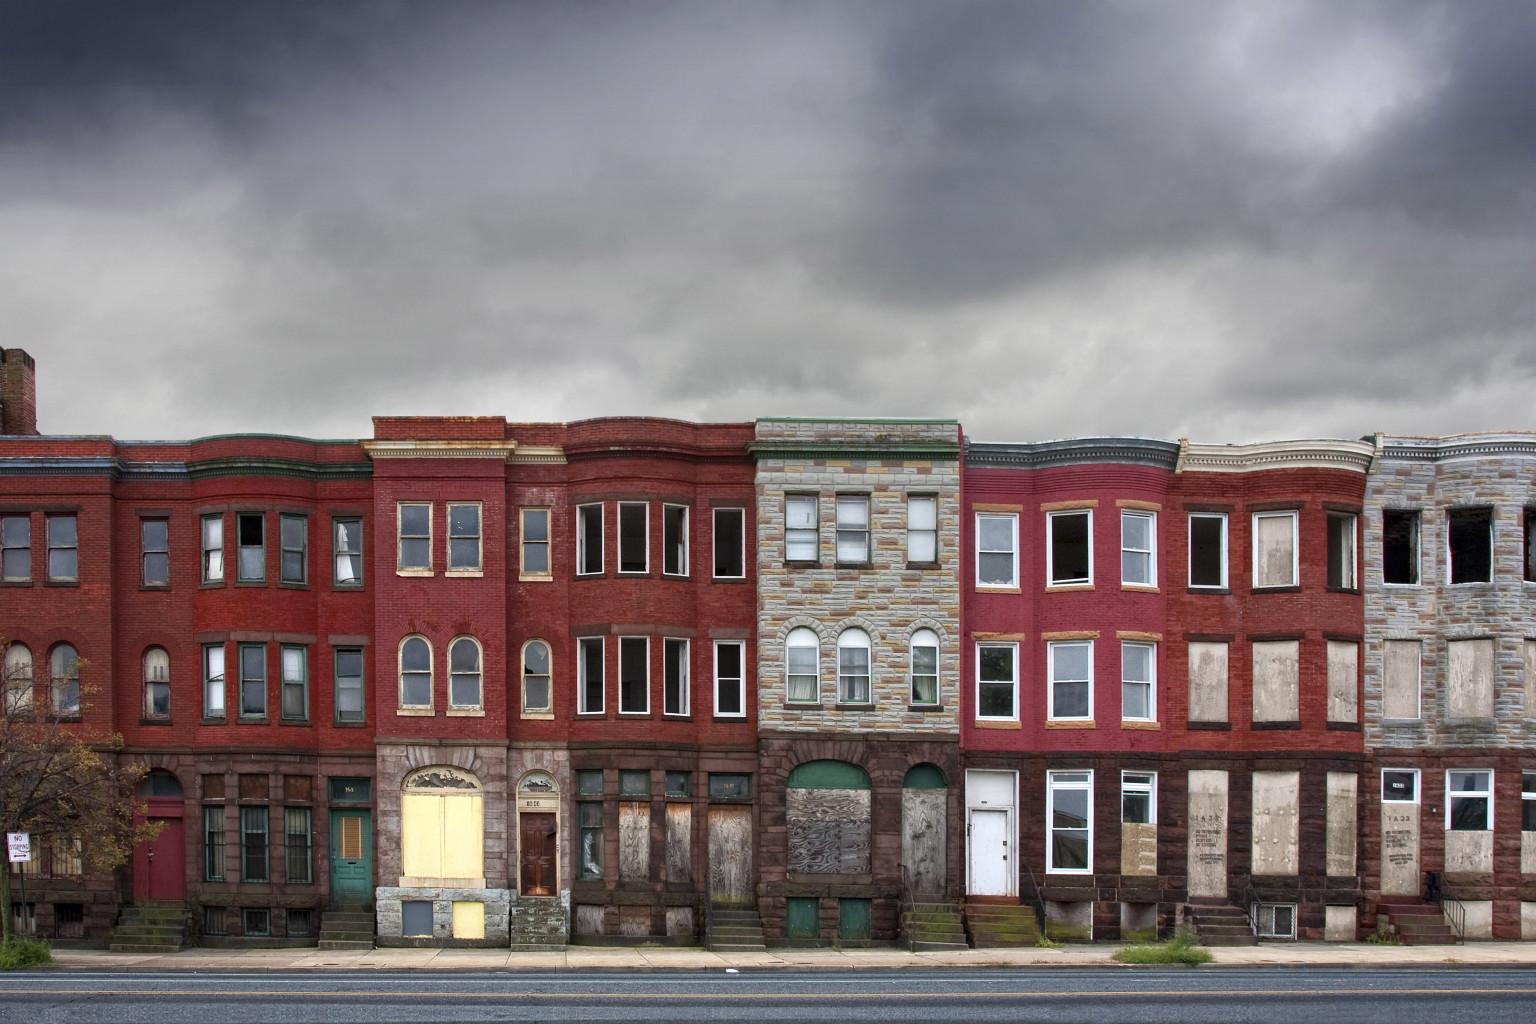 Baltimore Housing (Credit: ujreview.com)